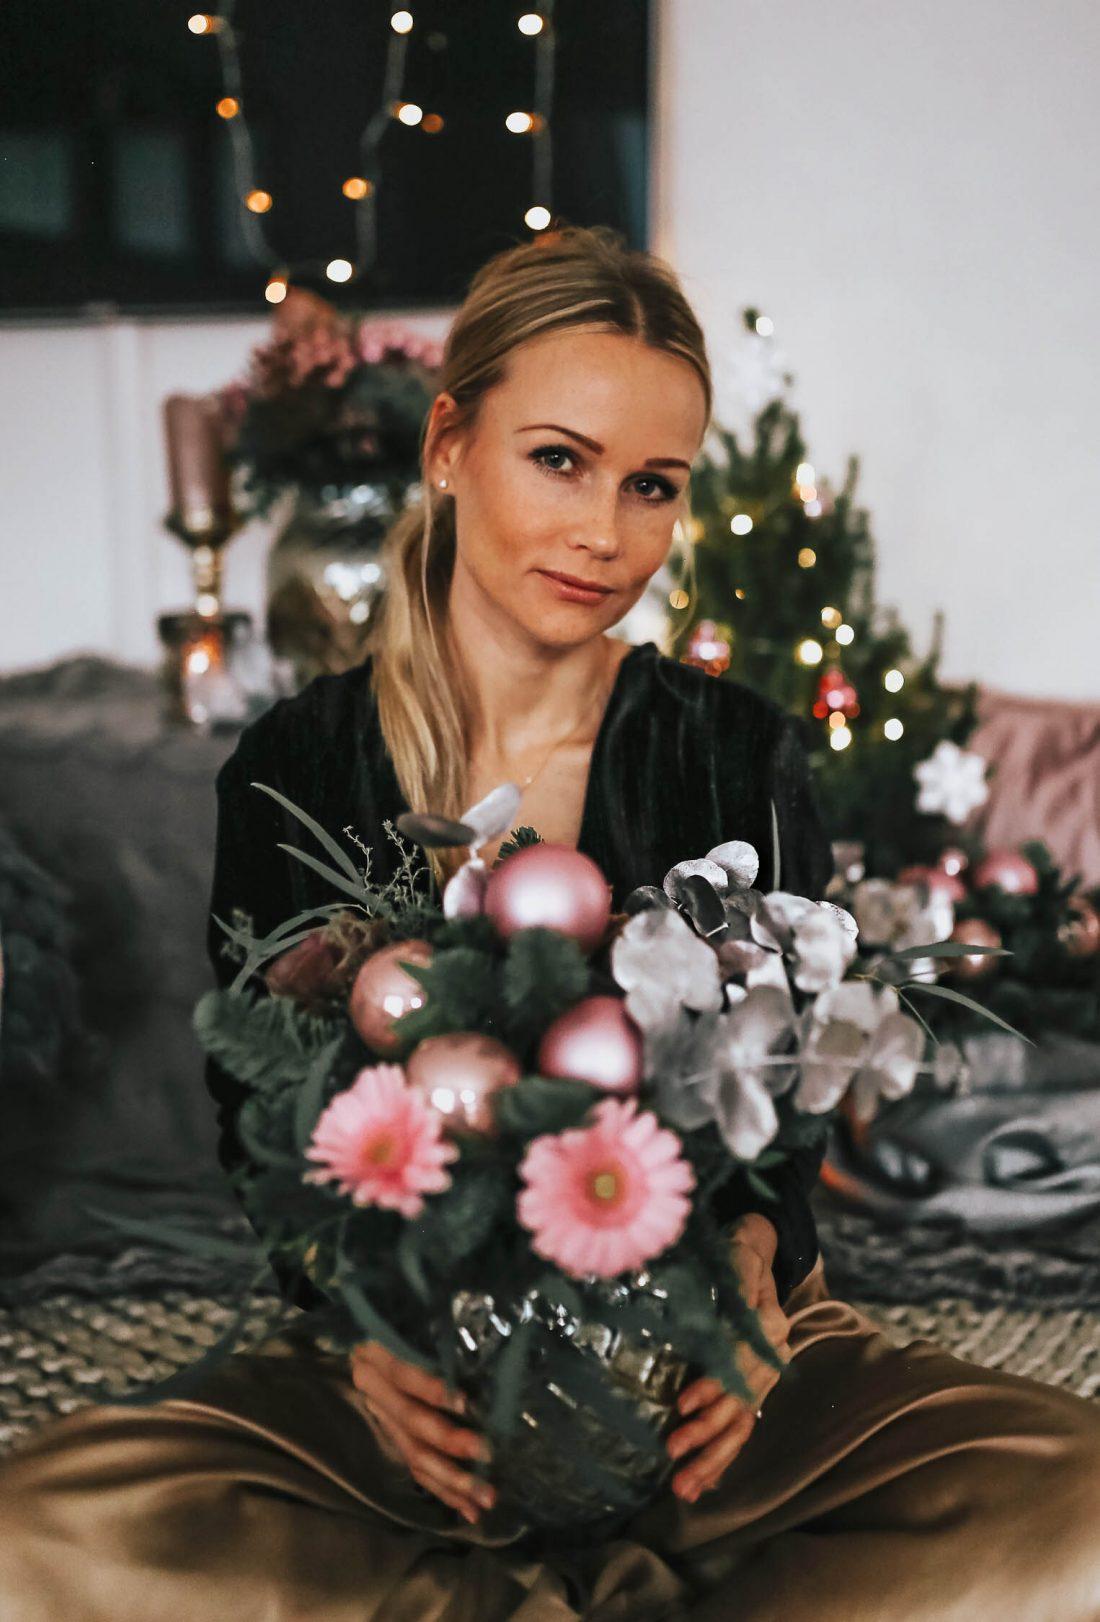 stylingliebe-lifestyleblog-mamablog-fashionblog-muenchen-familienblog-blogger-deutschland-lifestyleblog-familienblogger-lifestyleblogger-weihnachten-2018-im-hause-stylingliebe-8-1100x1622